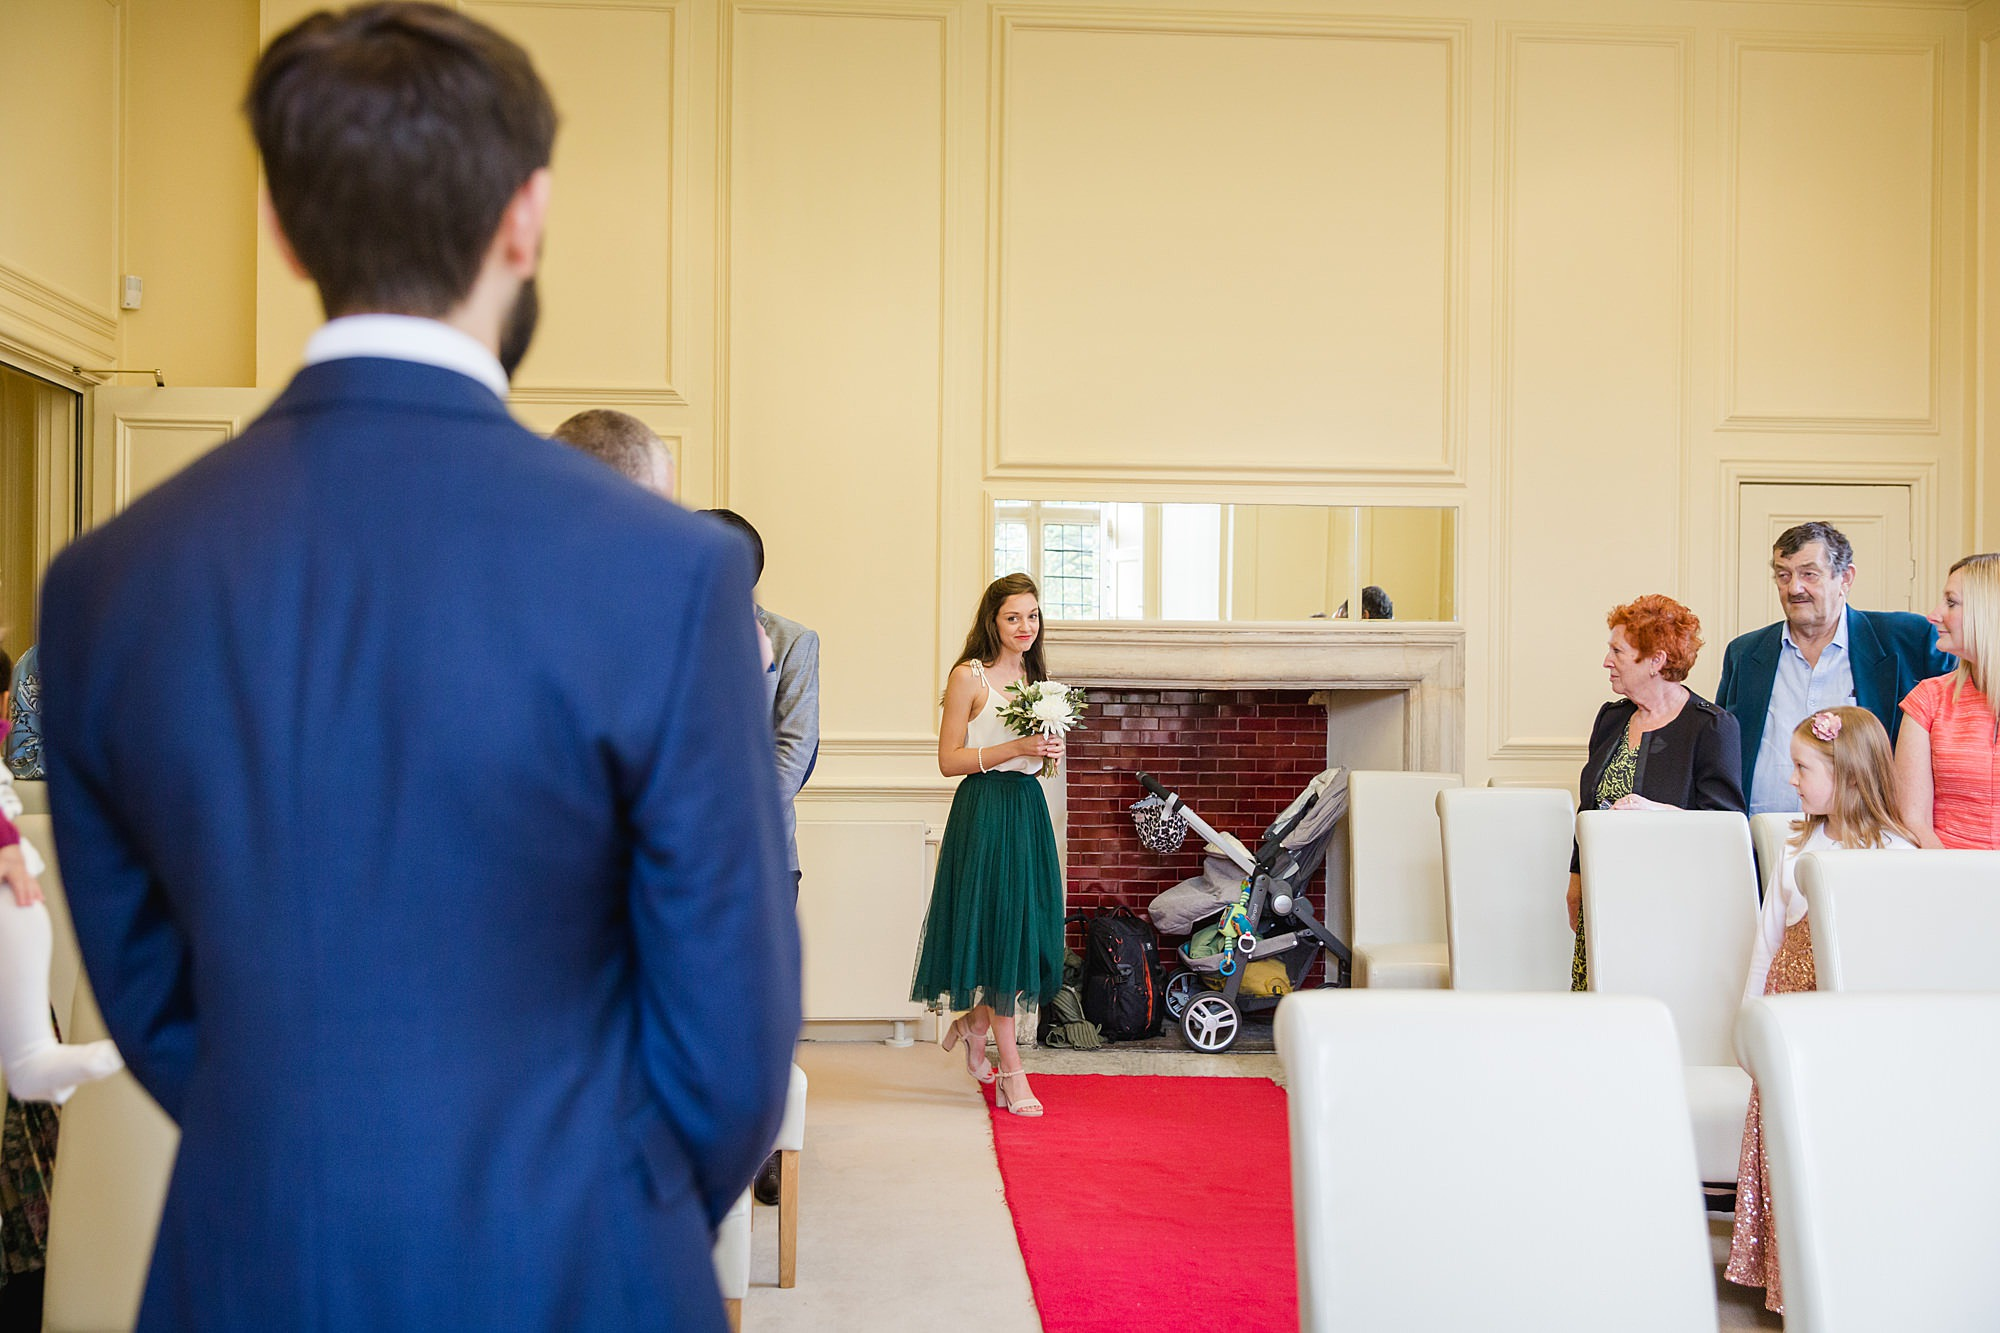 shaw house wedding bridesmaid walks down aisle